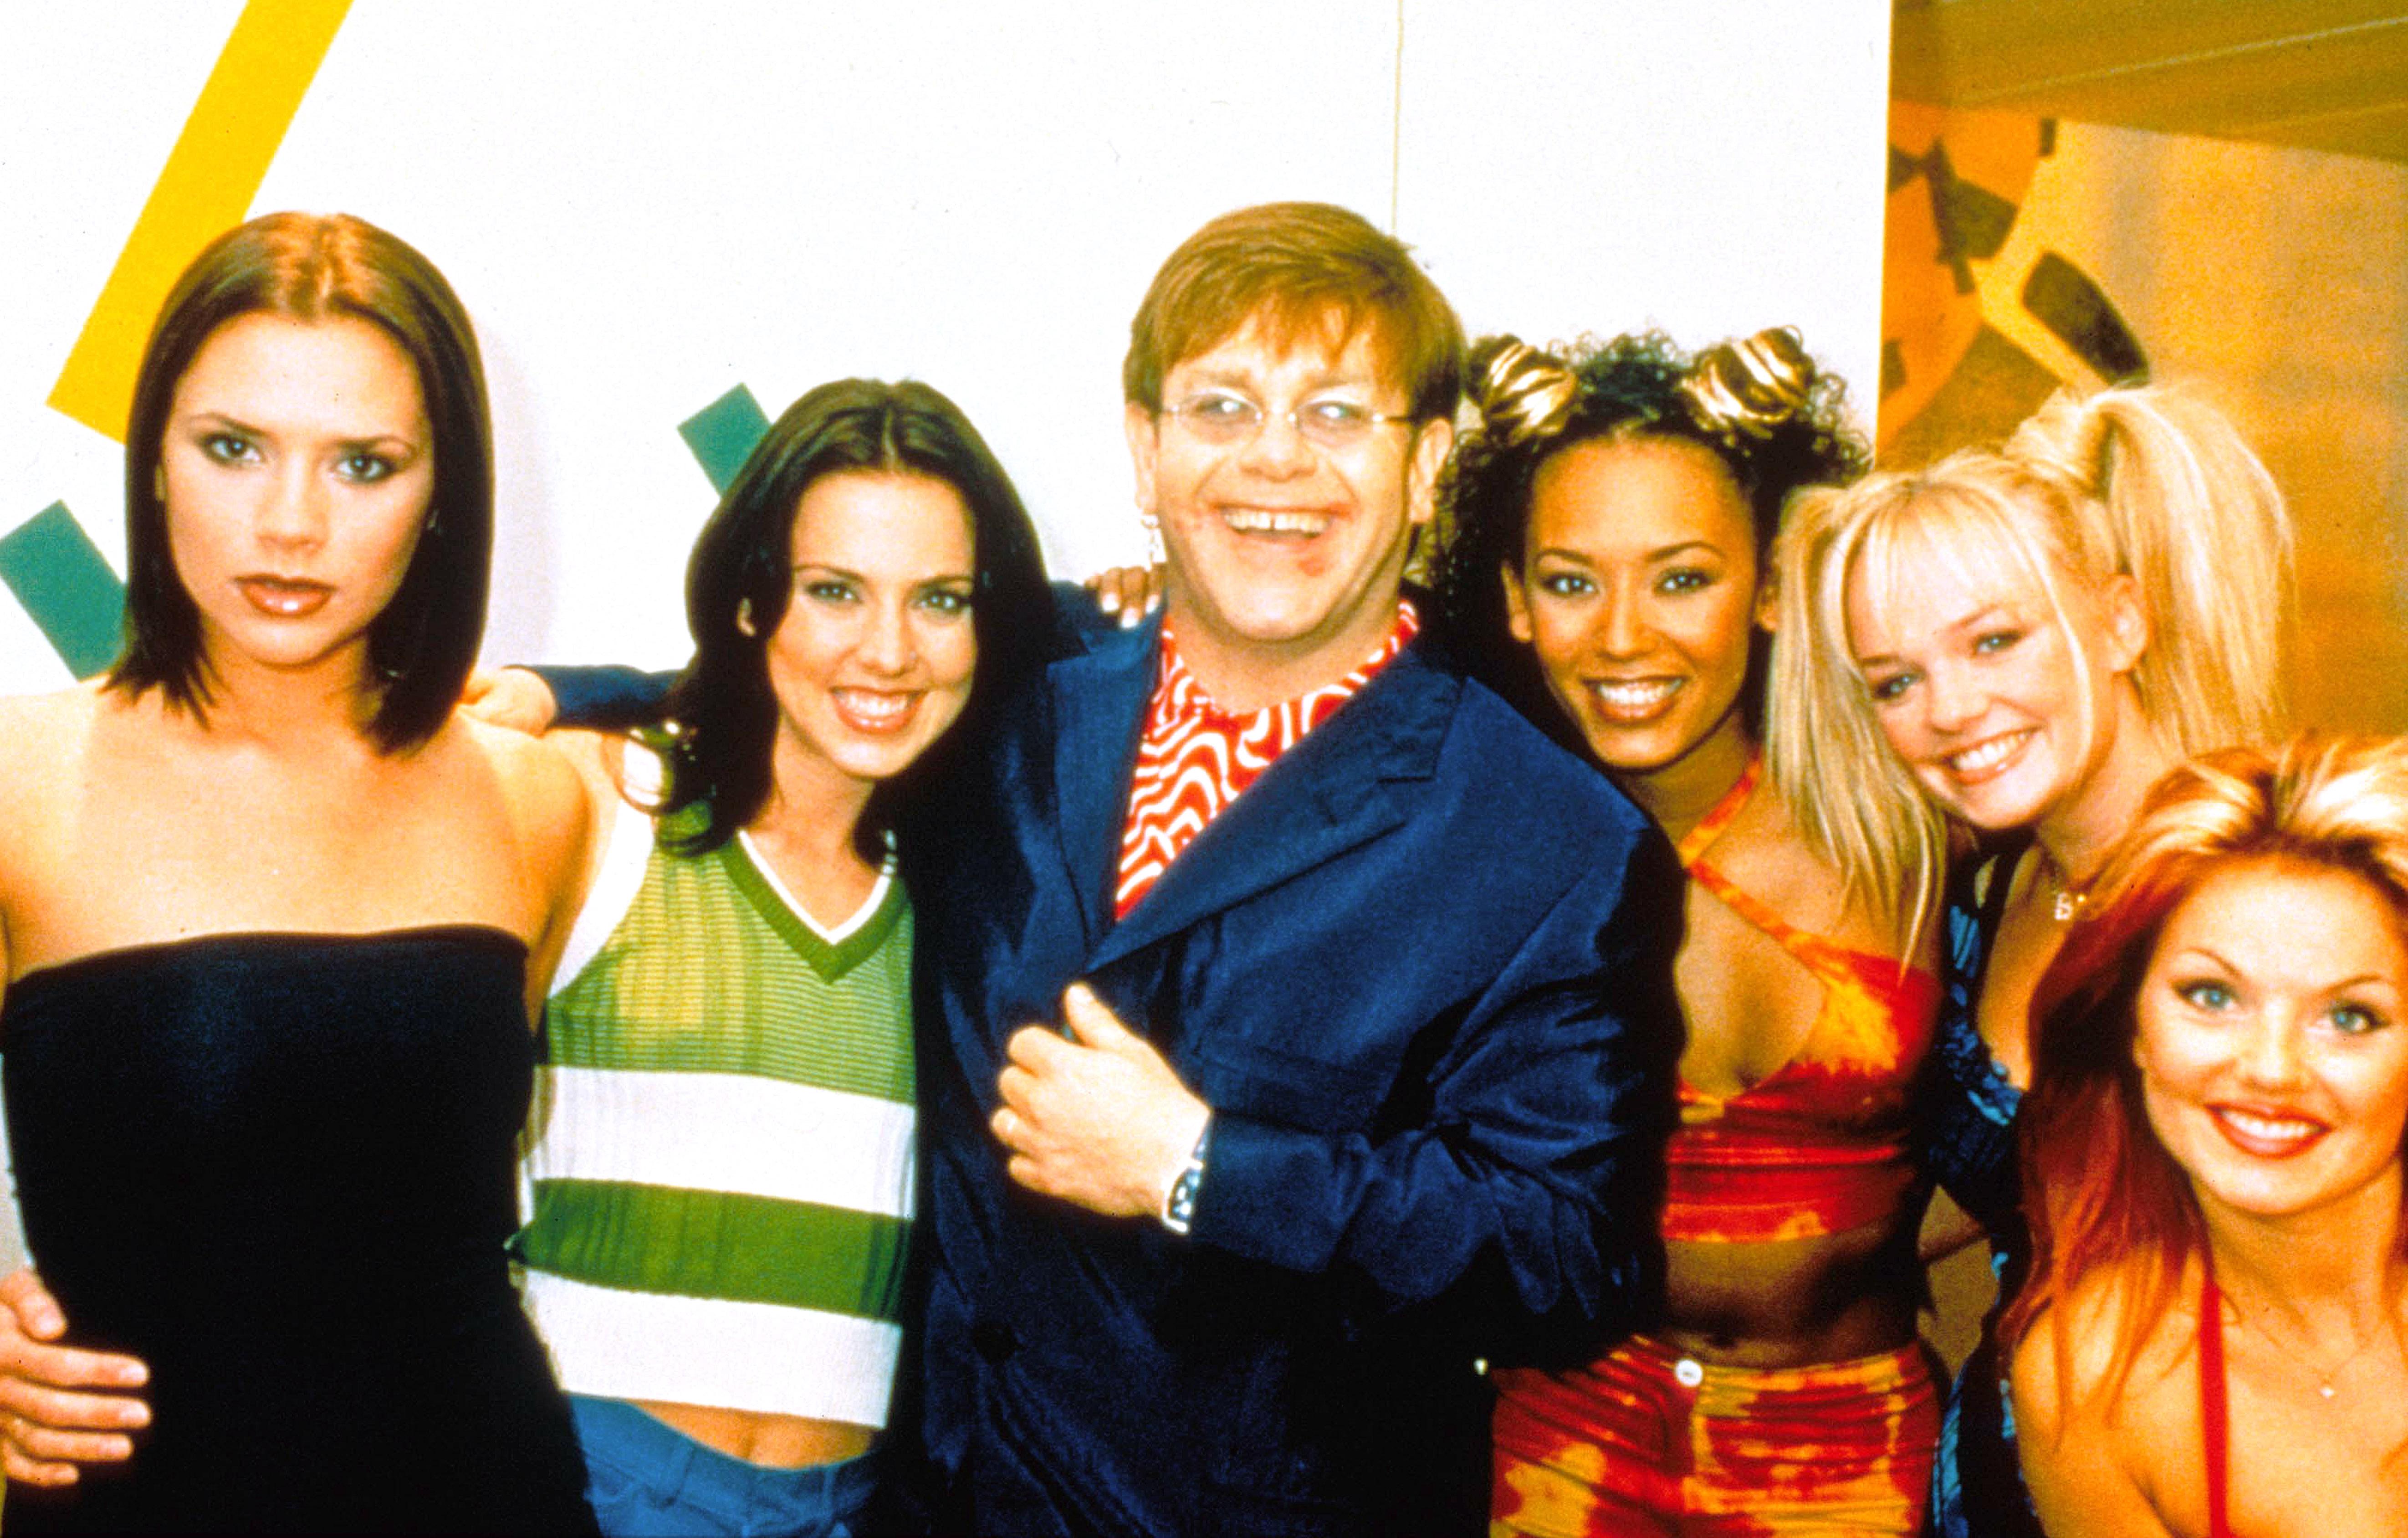 Spice World, Victoria Beckham, Melanie Chisholm, Elton John, Mel B., Elton John, Emma Bunton, Geri Halliwell